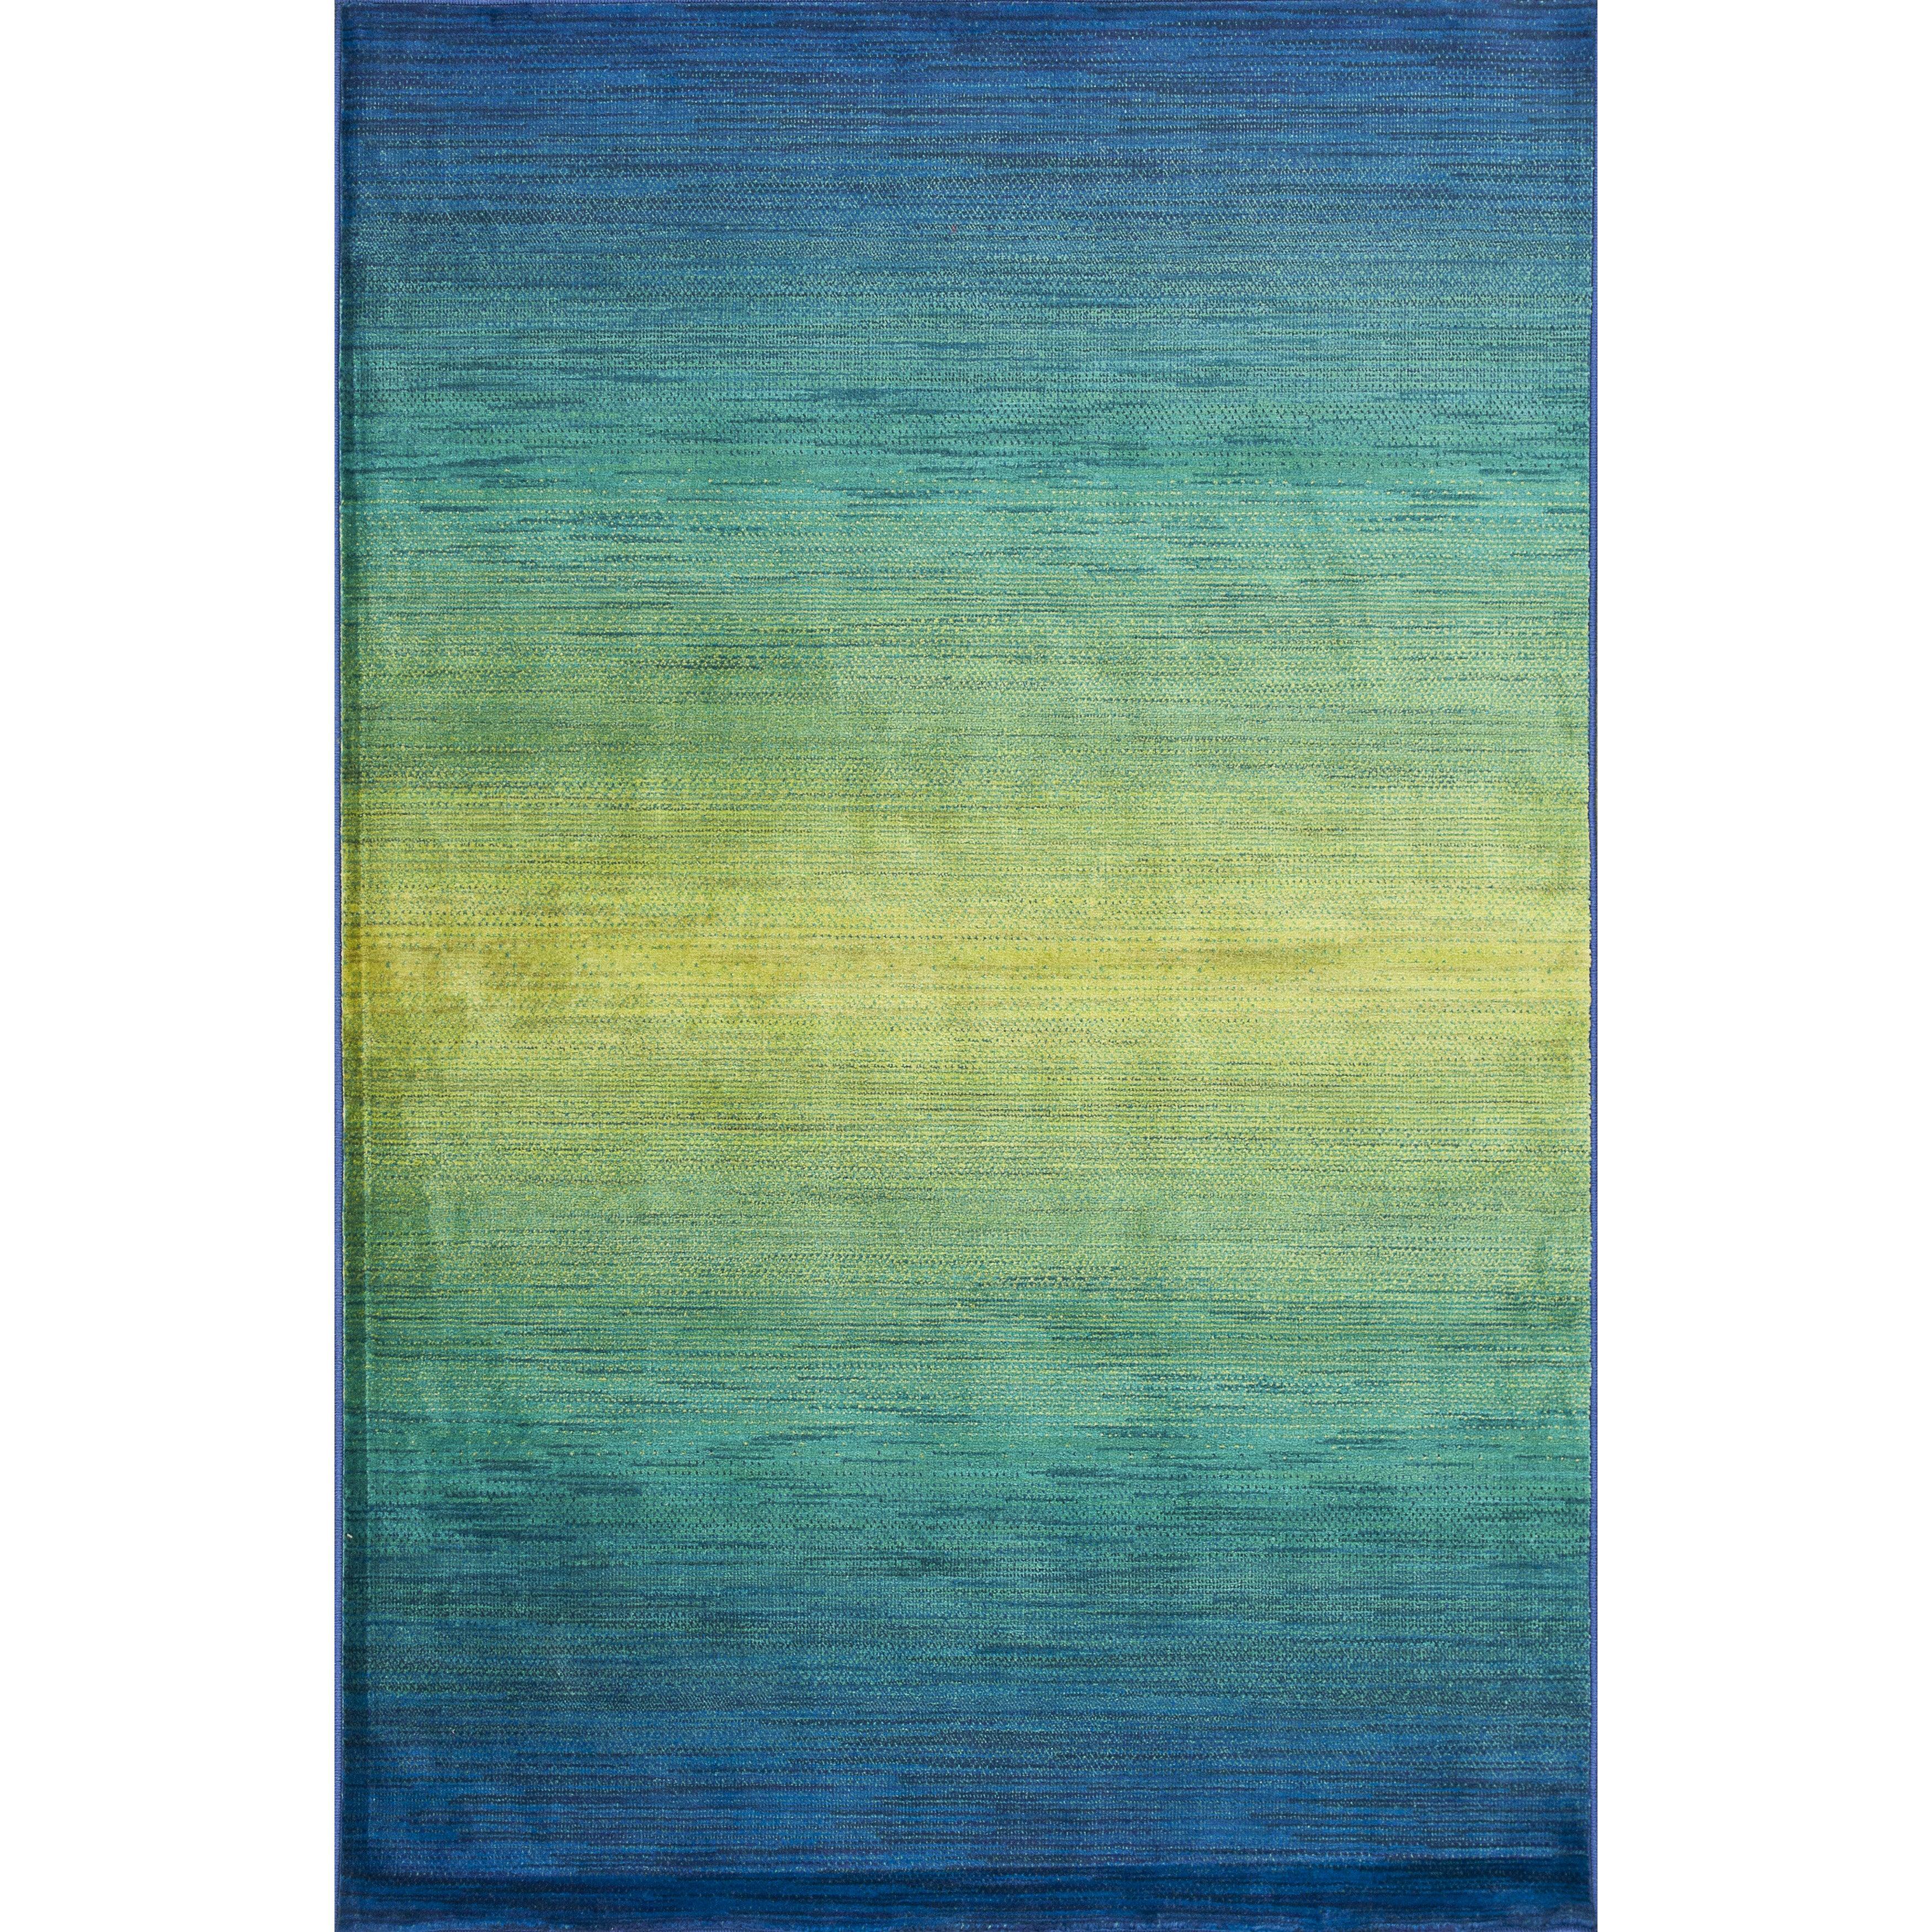 Alexander Home Skye Monet Waterfall Rug (5'2 x 7'7) (Wate...